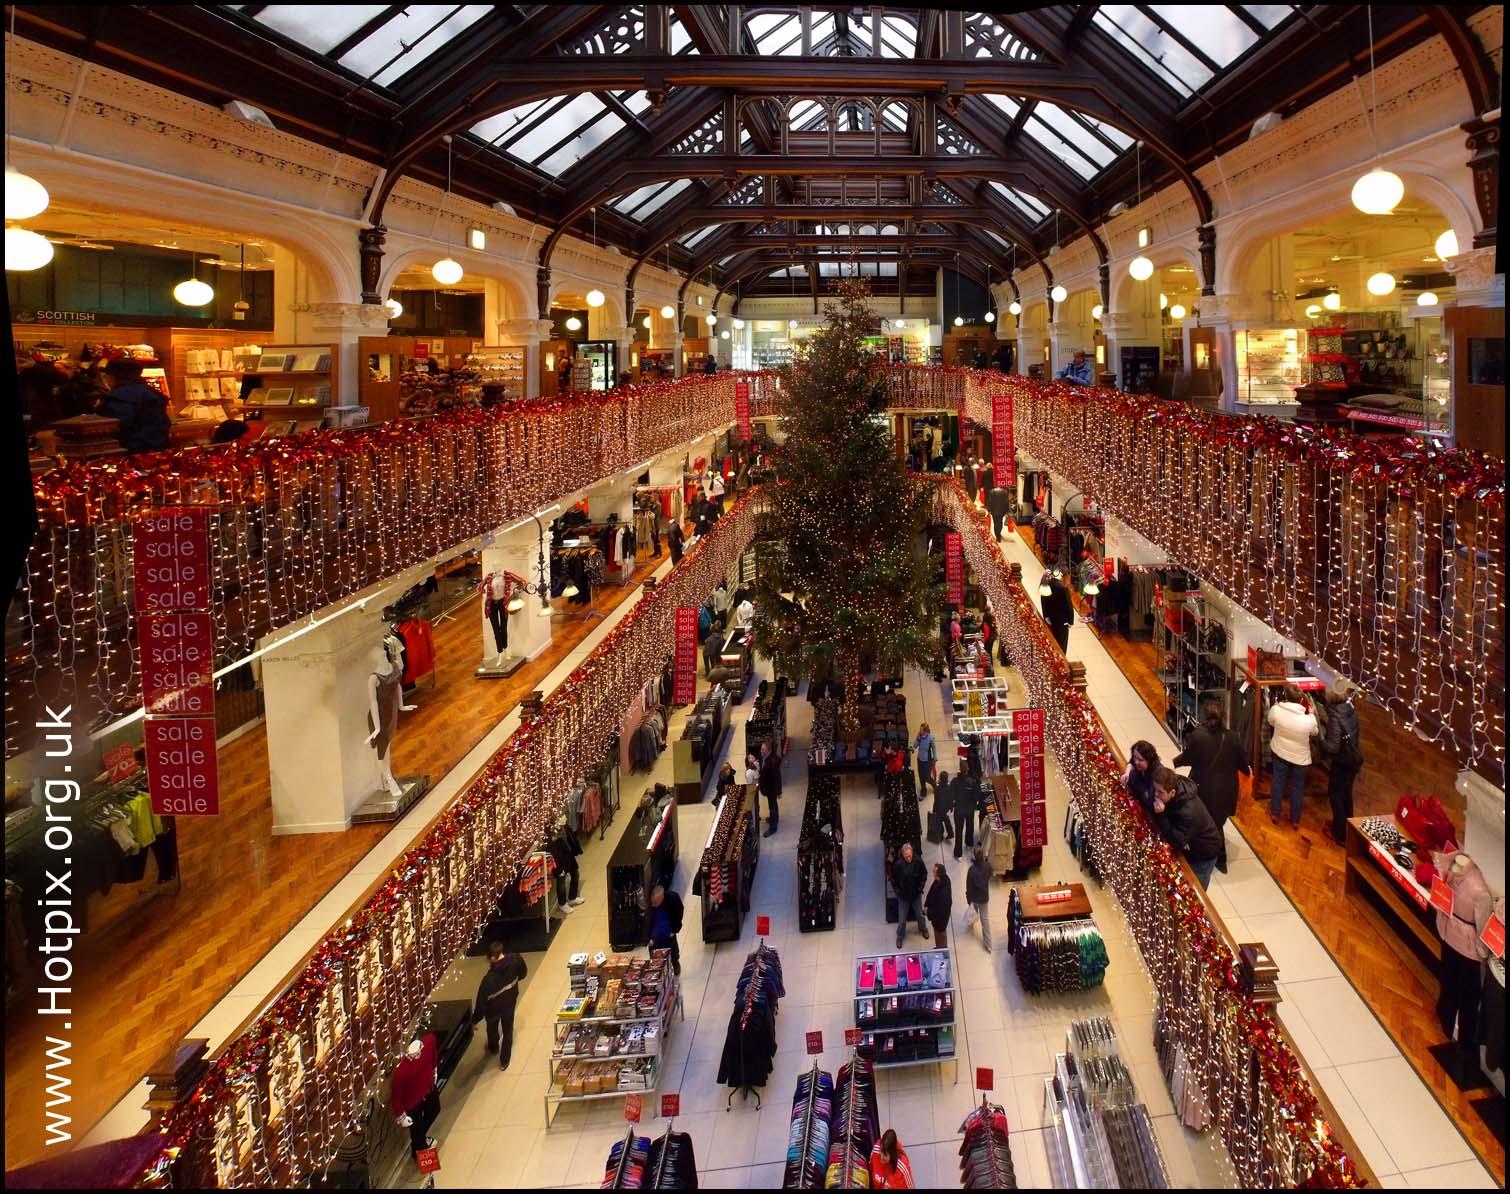 Jenners,Xmas,Christmas,tree,Edinburgh,Scotland,Princes,St,Street,shop,shopping,store,department,december,Schotland,l'Ecosse,Ecosse,Schottland,\u03a3\u03ba\u03c9\u03c4\u03af\u03b1,la,Scozia,\u30b9\u30b3\u30c3\u30c8\u30e9\u30f3\u30c9,\uc2a4\ucf54\ud2c0\ub780\ub4dc,\u0428\u043e\u0442\u043b\u0430\u043d\u0434\u0438\u044f,Escocia,winter,Edinburghe,wide,superwide,tonysmith,tony,smith,Panoramique,int\u00e9ressant,join,joiner,stitch,stitcher,autostitch,auto,pano,imagen,panor\u00e1mica,image,panoramisches,Bild,edinbrugh,stitched,panorama,joined,images,widescreen,\u043f\u0430\u043d\u043e\u0440\u0430\u043c\u0430,\u30d1\u30ce\u30e9\u30de,\u5168\u666f,\ud55c\uad6d\uc5b4,hotpix!,Edinburg,#tonysmithhotpix,edimburgh